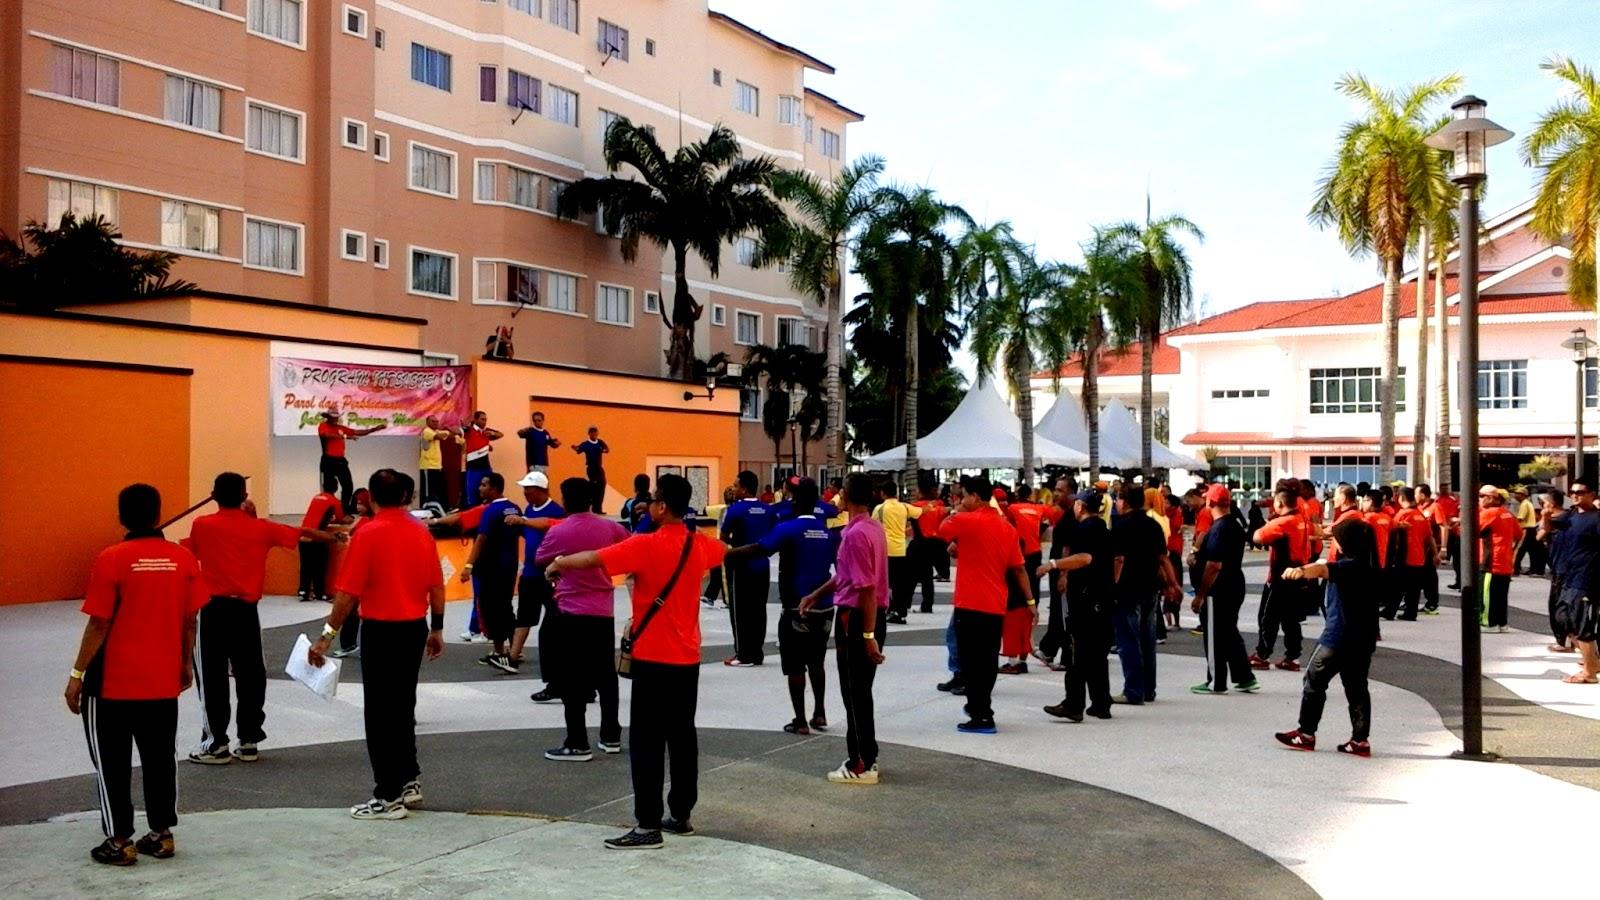 Program Intervensi Parol bersama keluarga di Primaland, Port Dickson, Parol WPKL